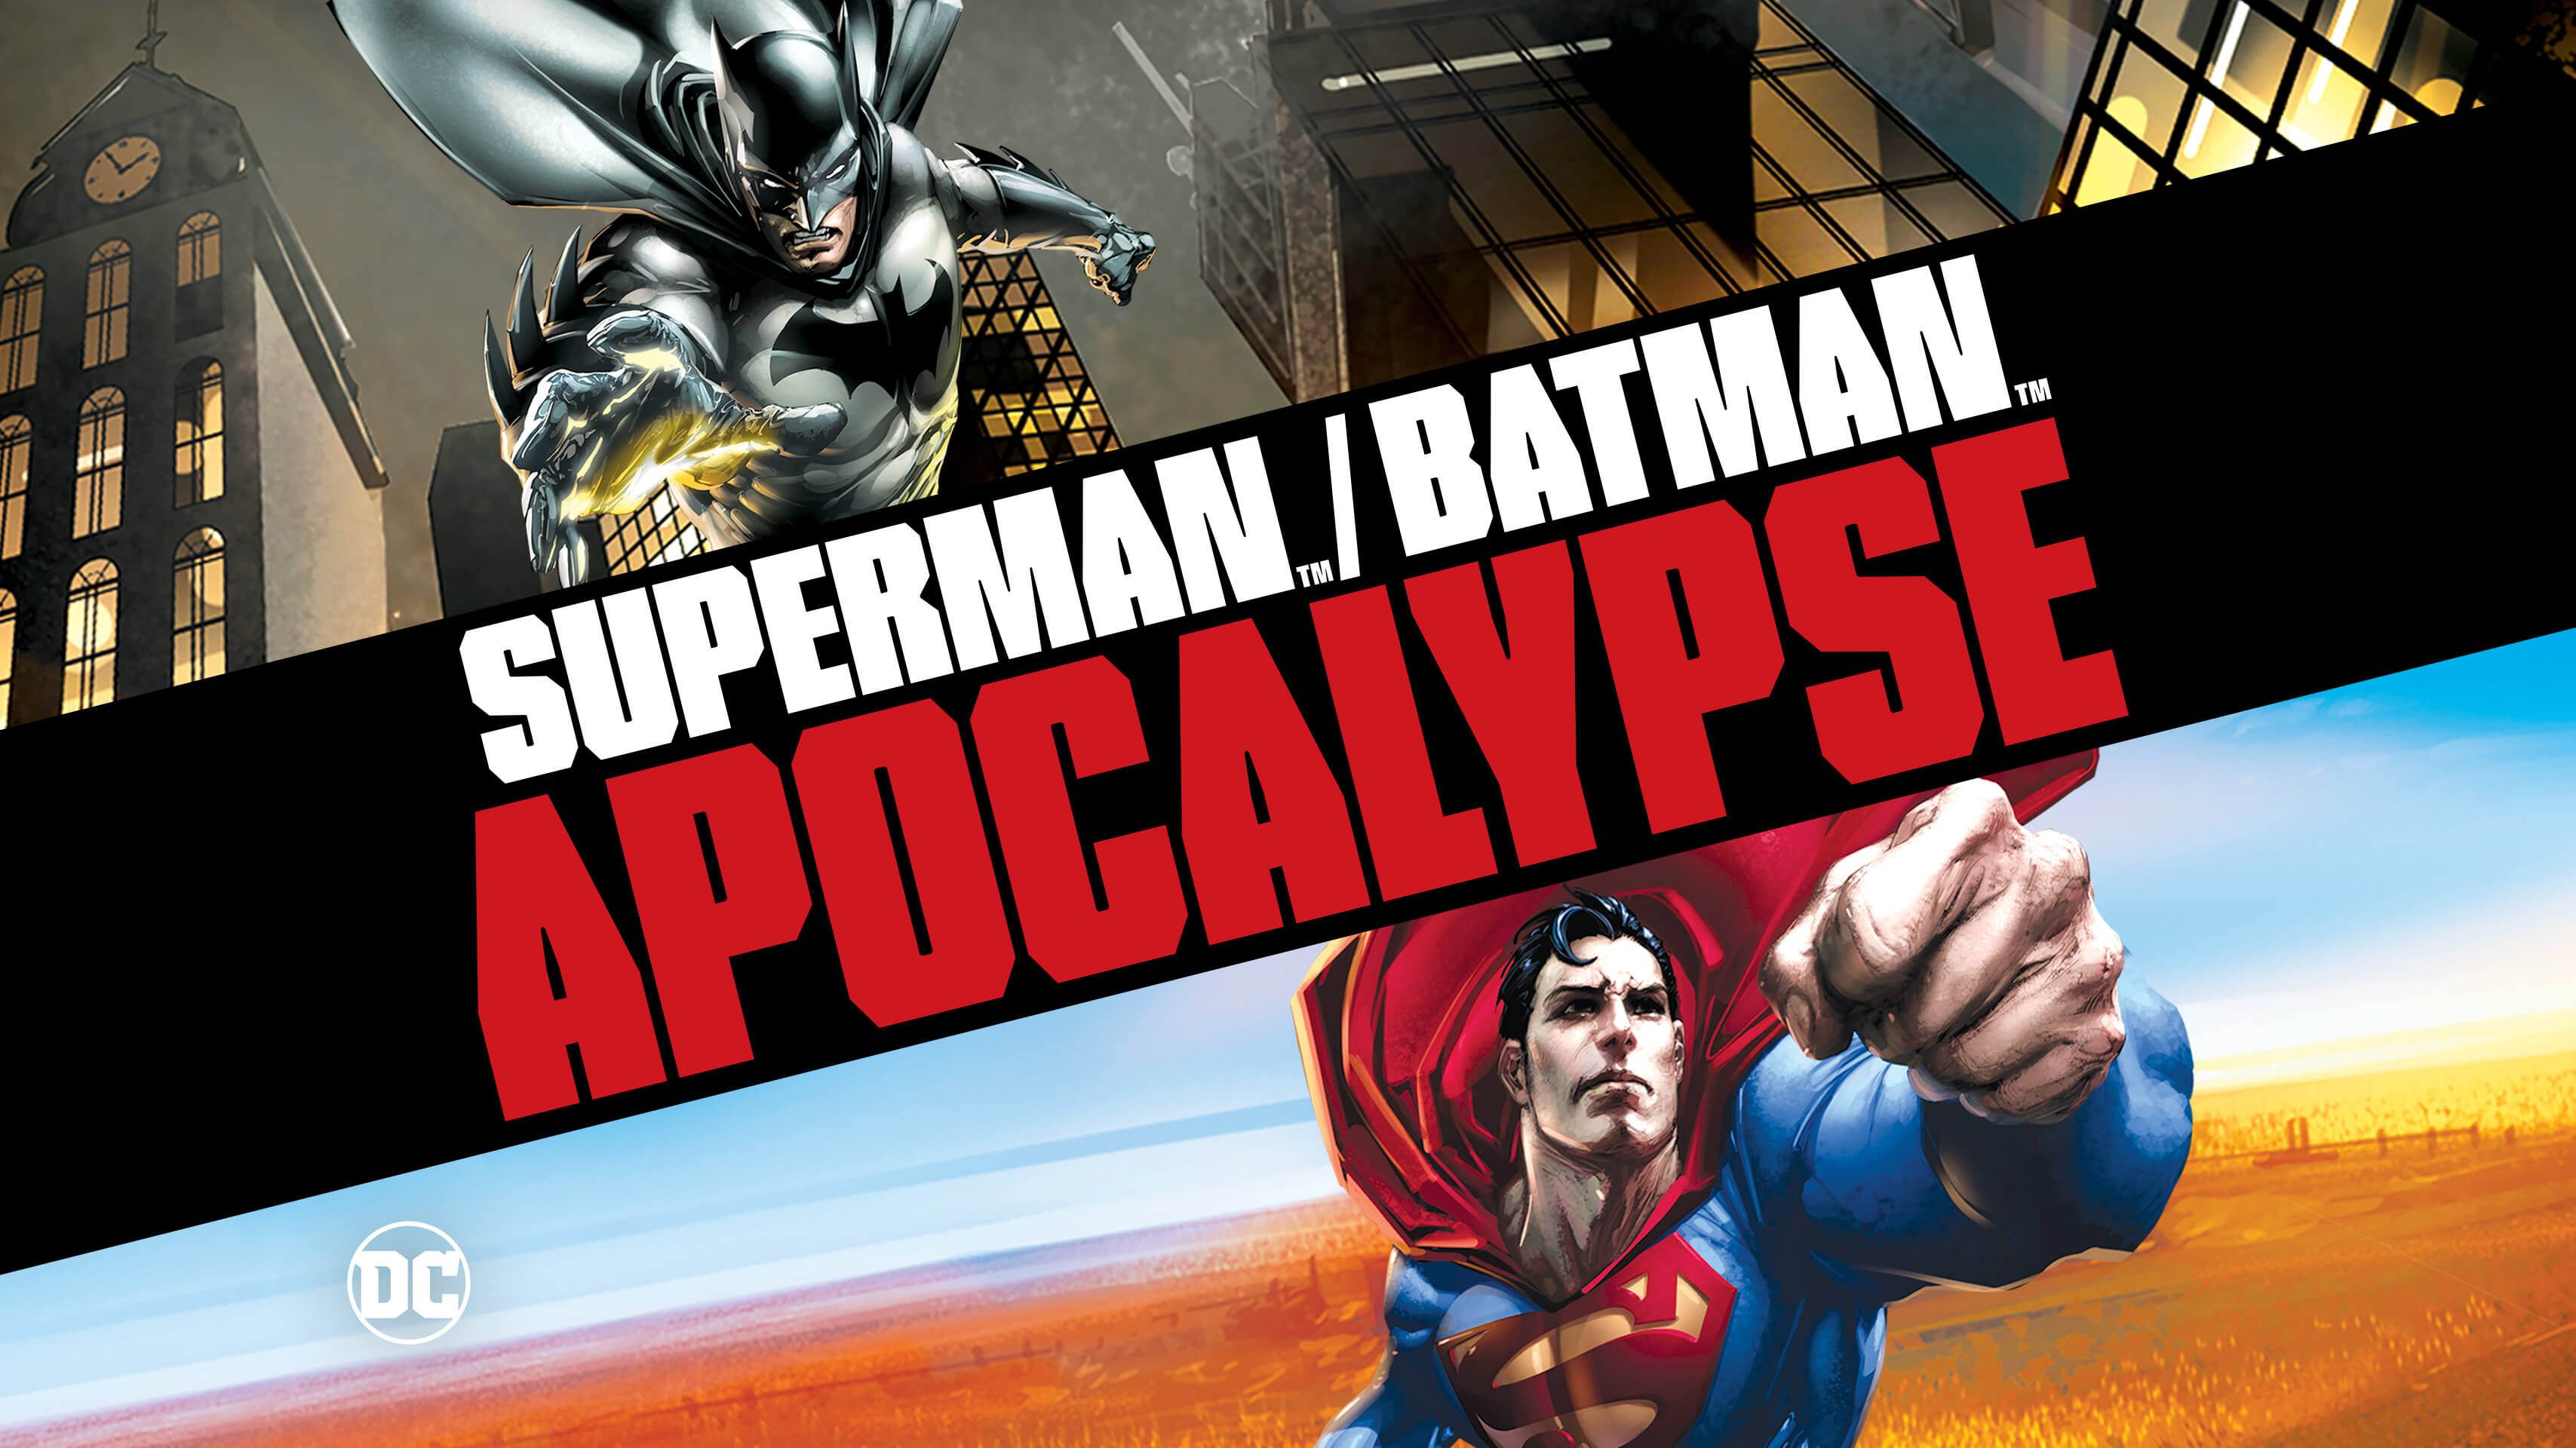 47_SupermanBatmanApocalypse_Landscape-2.jpg